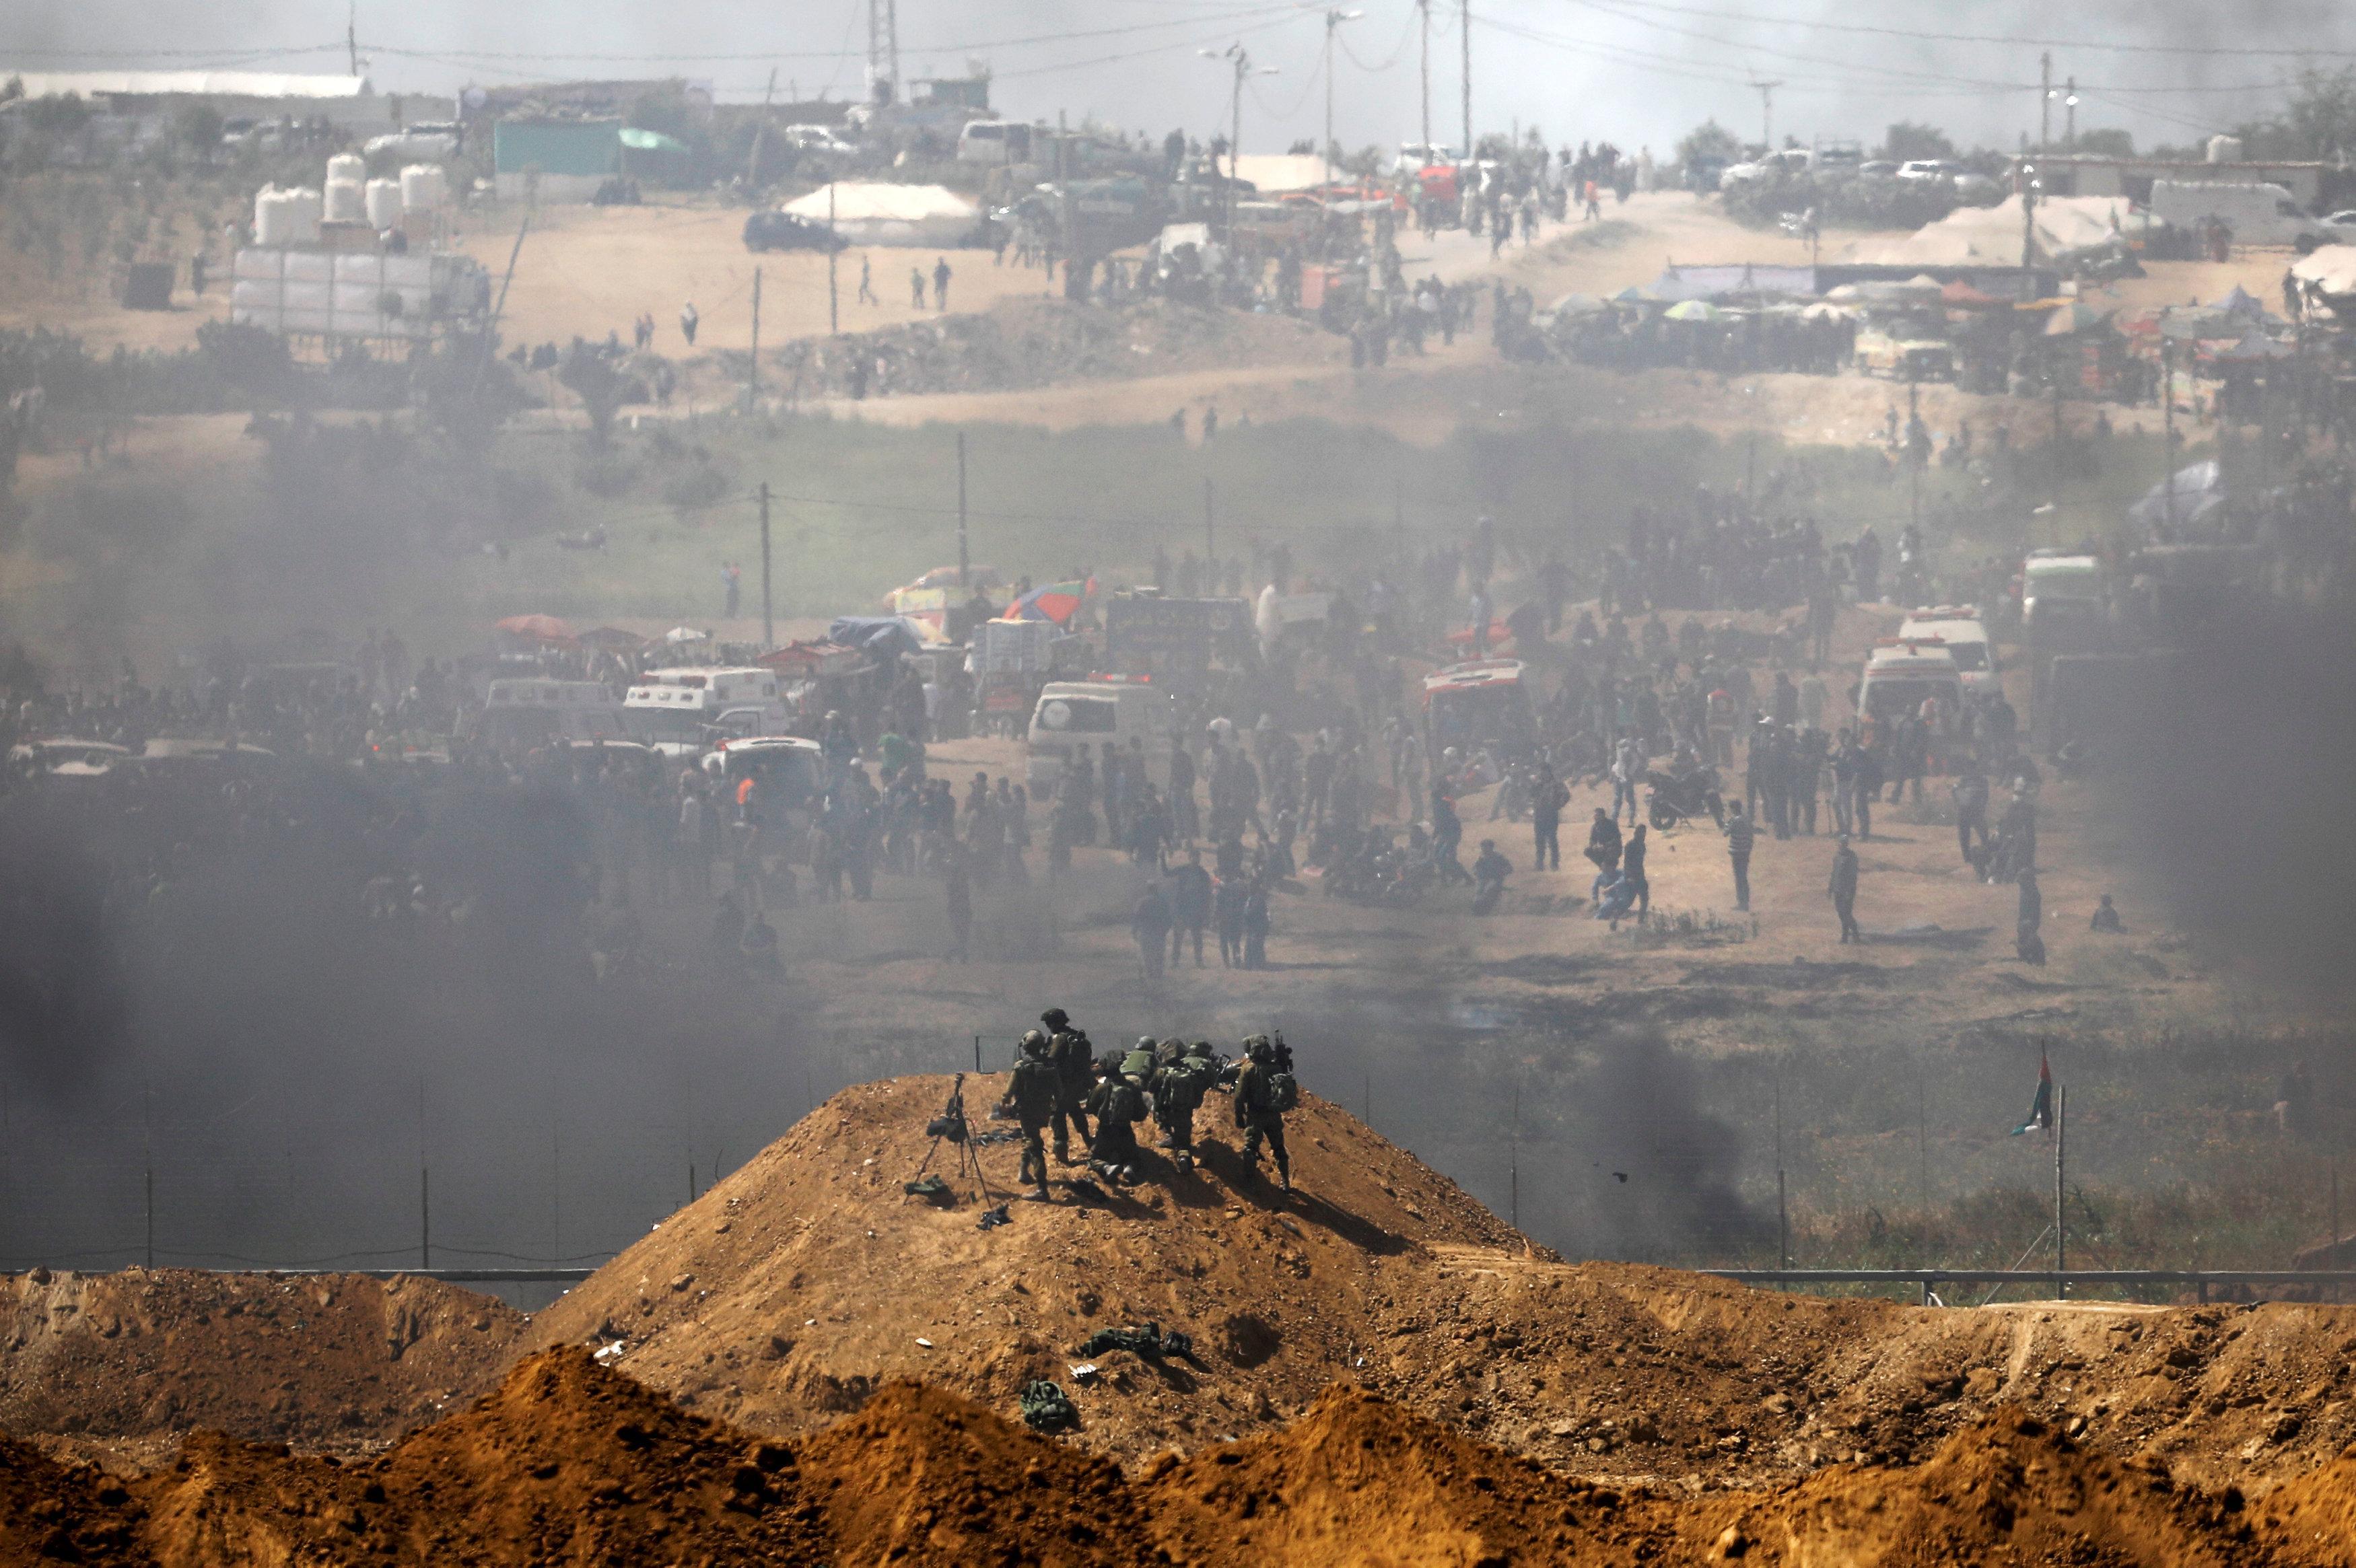 Explainer: Gaza's 70 years of woe - Reuters